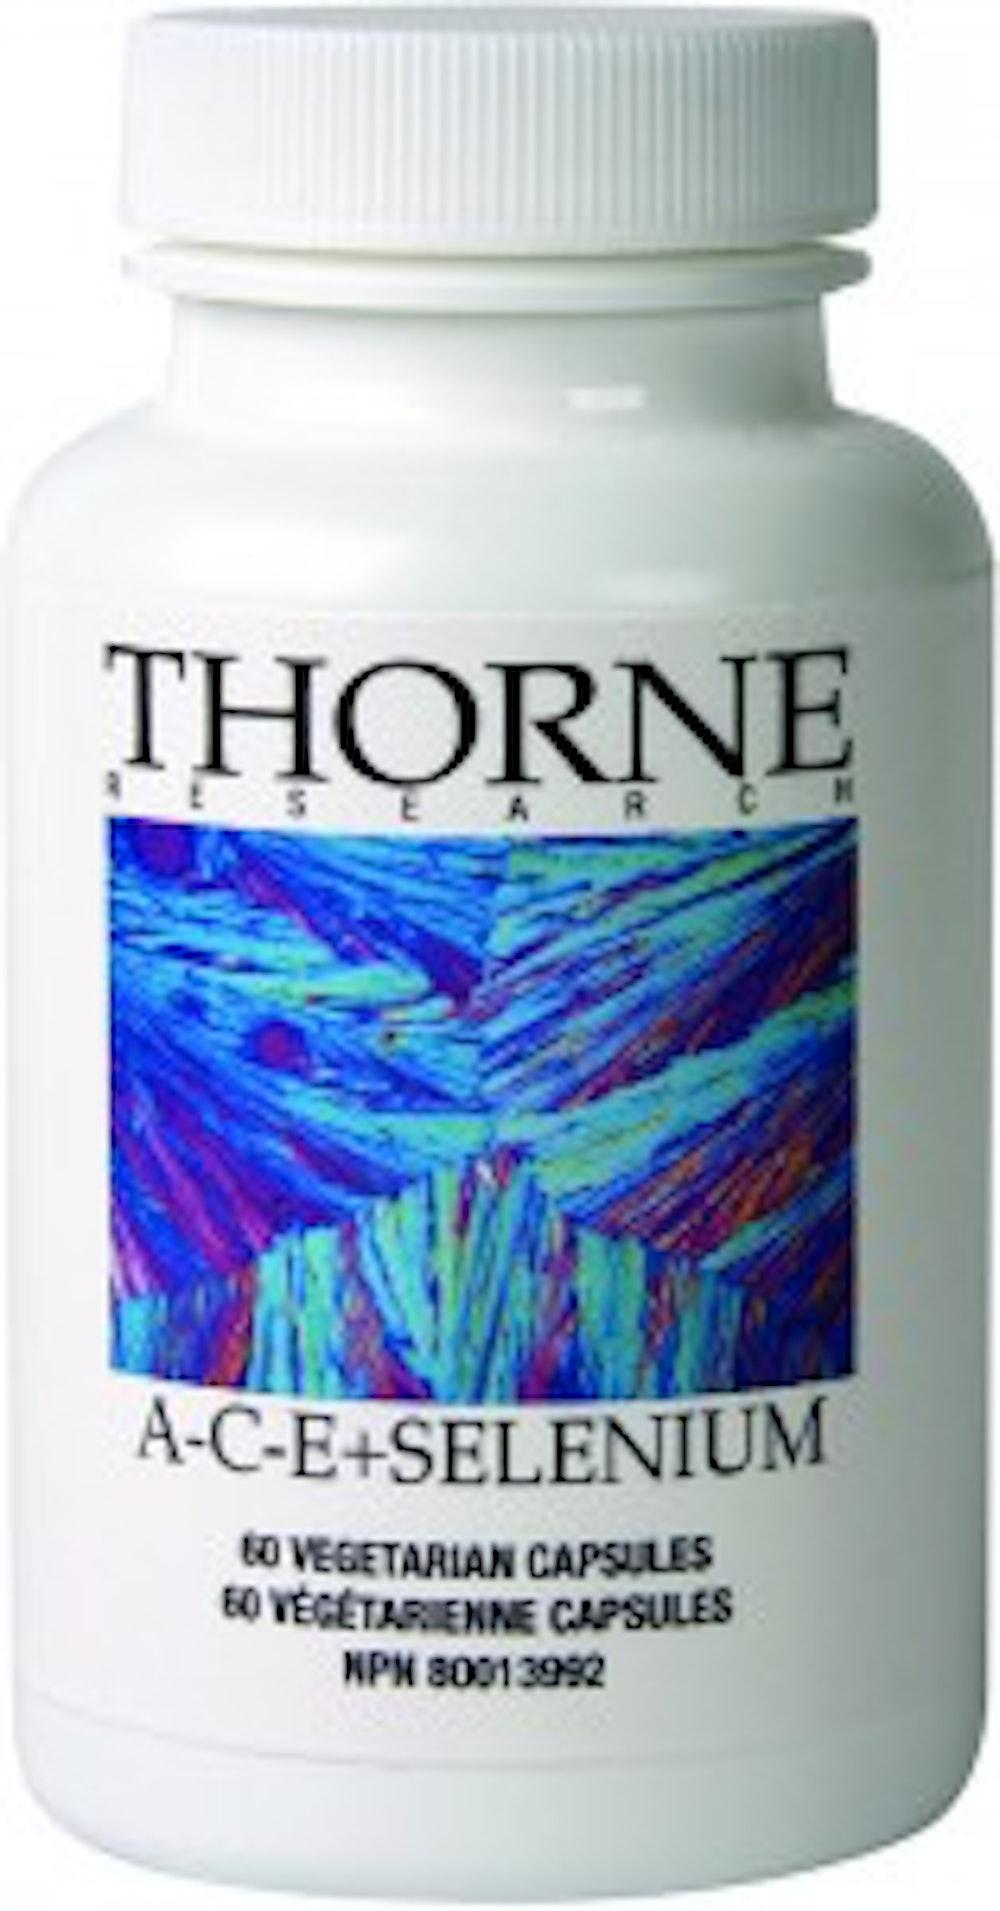 A-C-E+Selenium